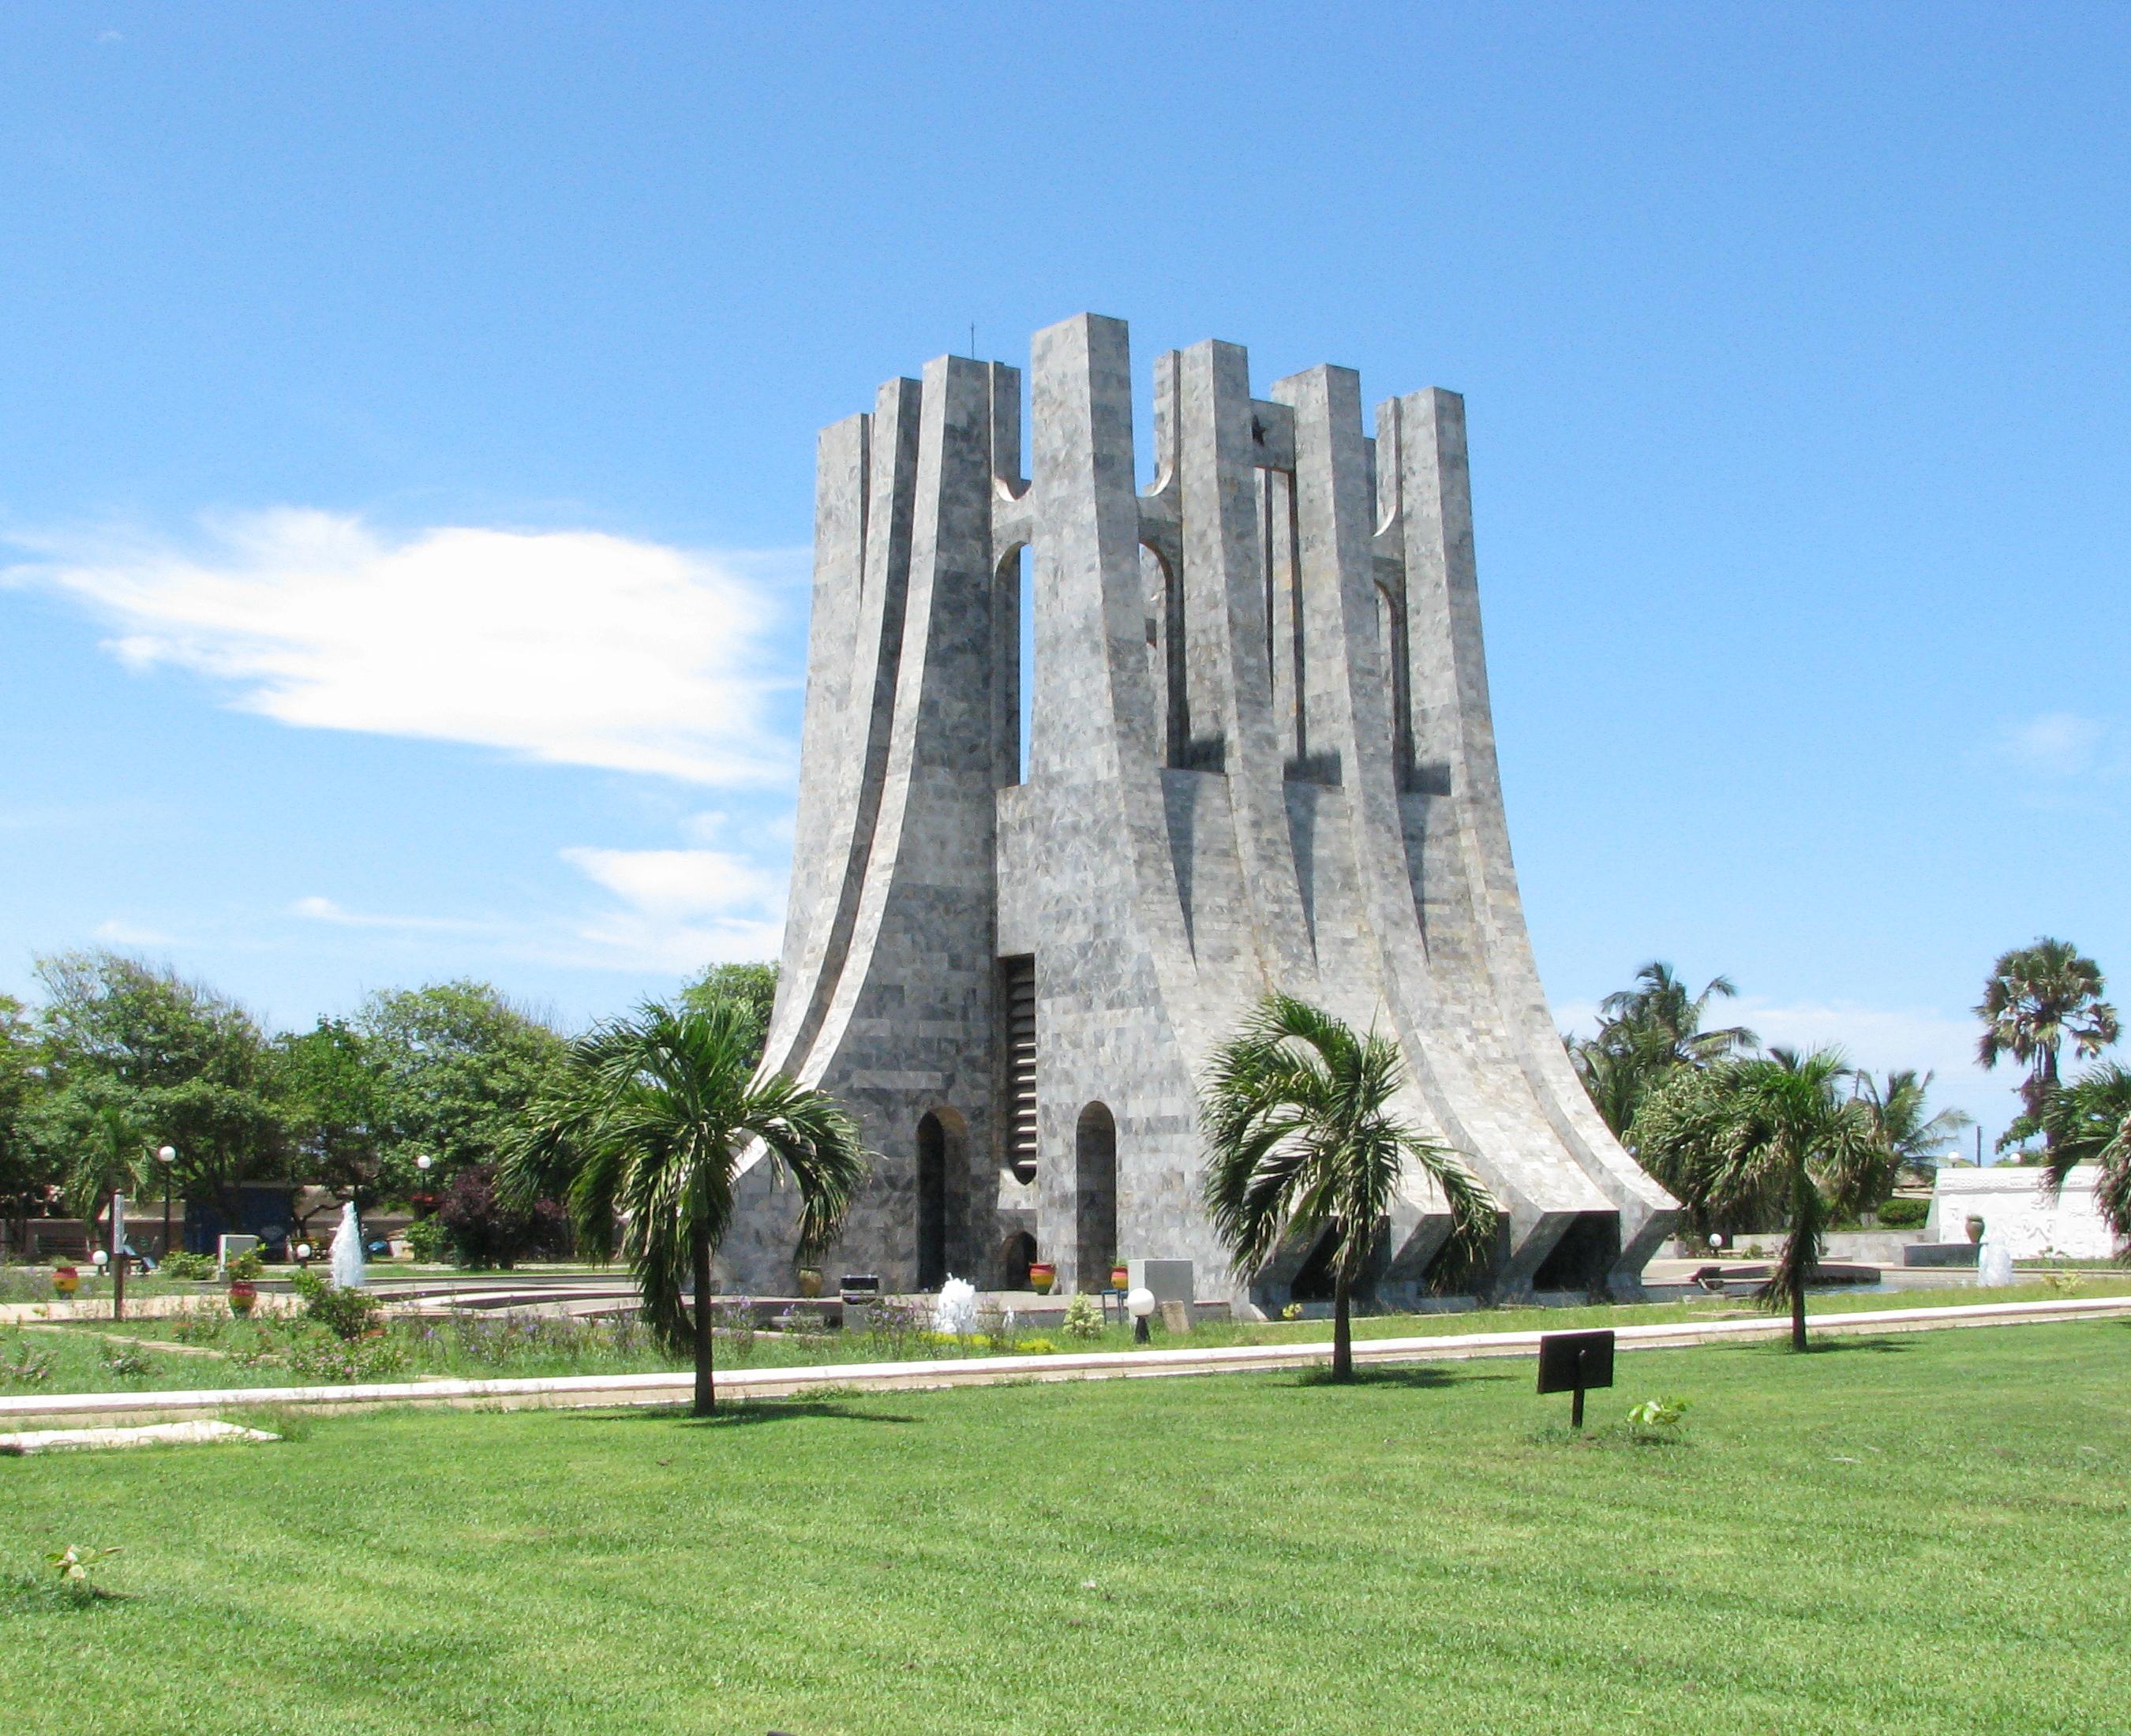 File:Kwame Nkrumah Mausoleum in Accra Ghana, May 2008.jpg ...